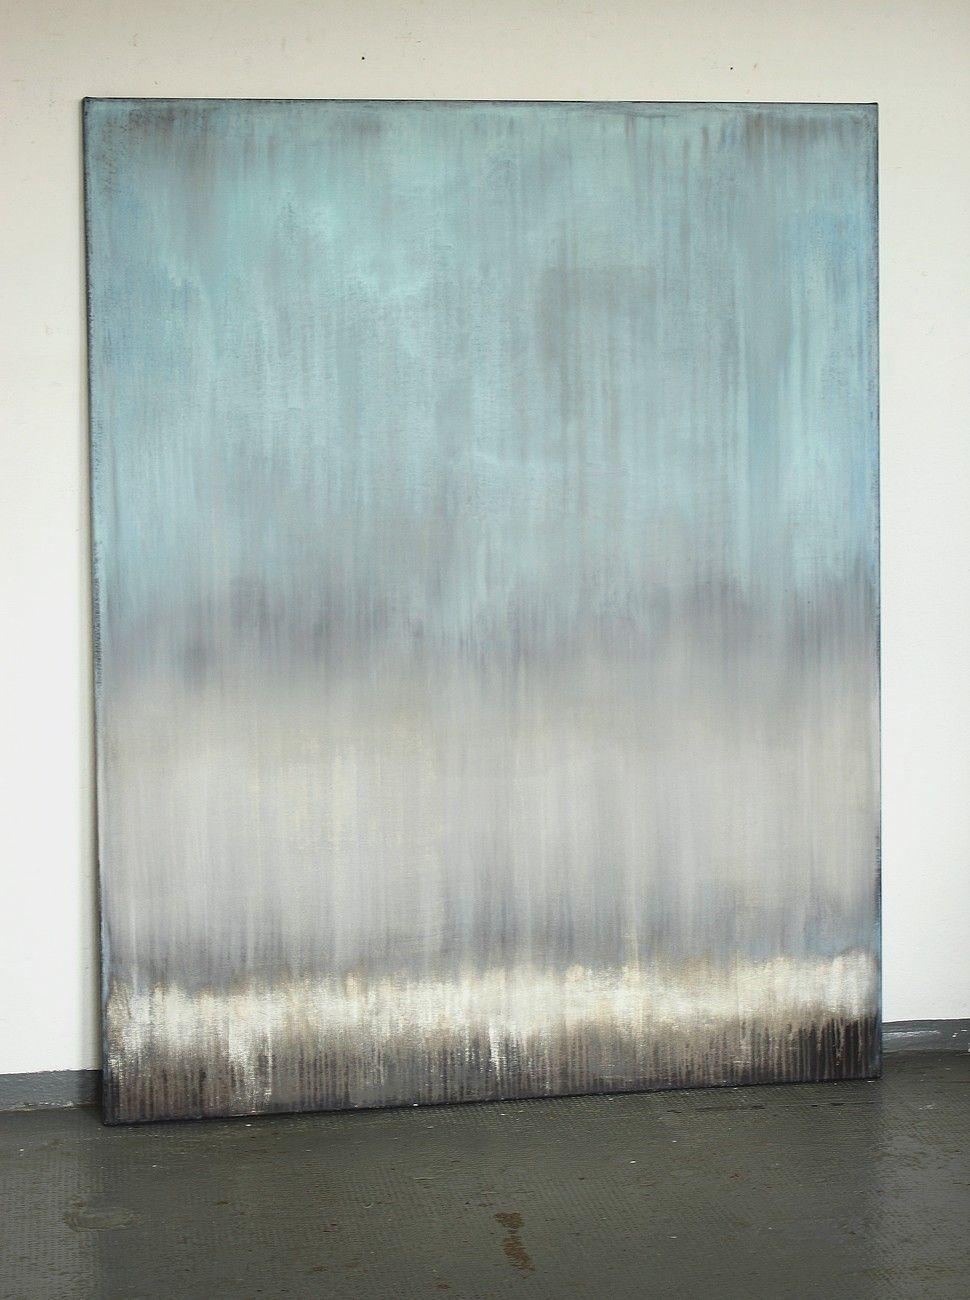 201 6 150 x 120 cm Acryl auf Leinwand , abstrakte